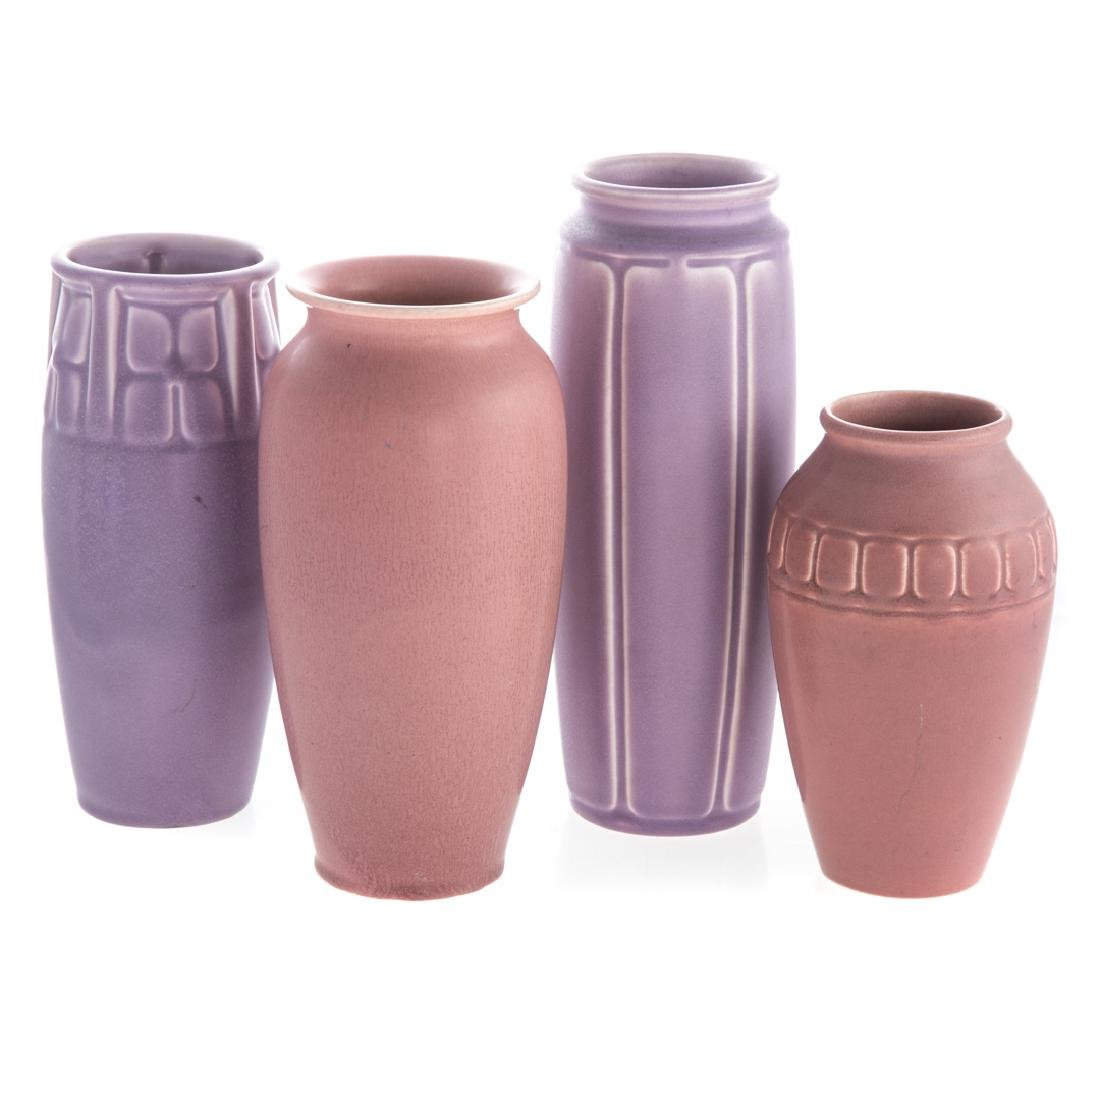 Four Rookwood art pottery vases